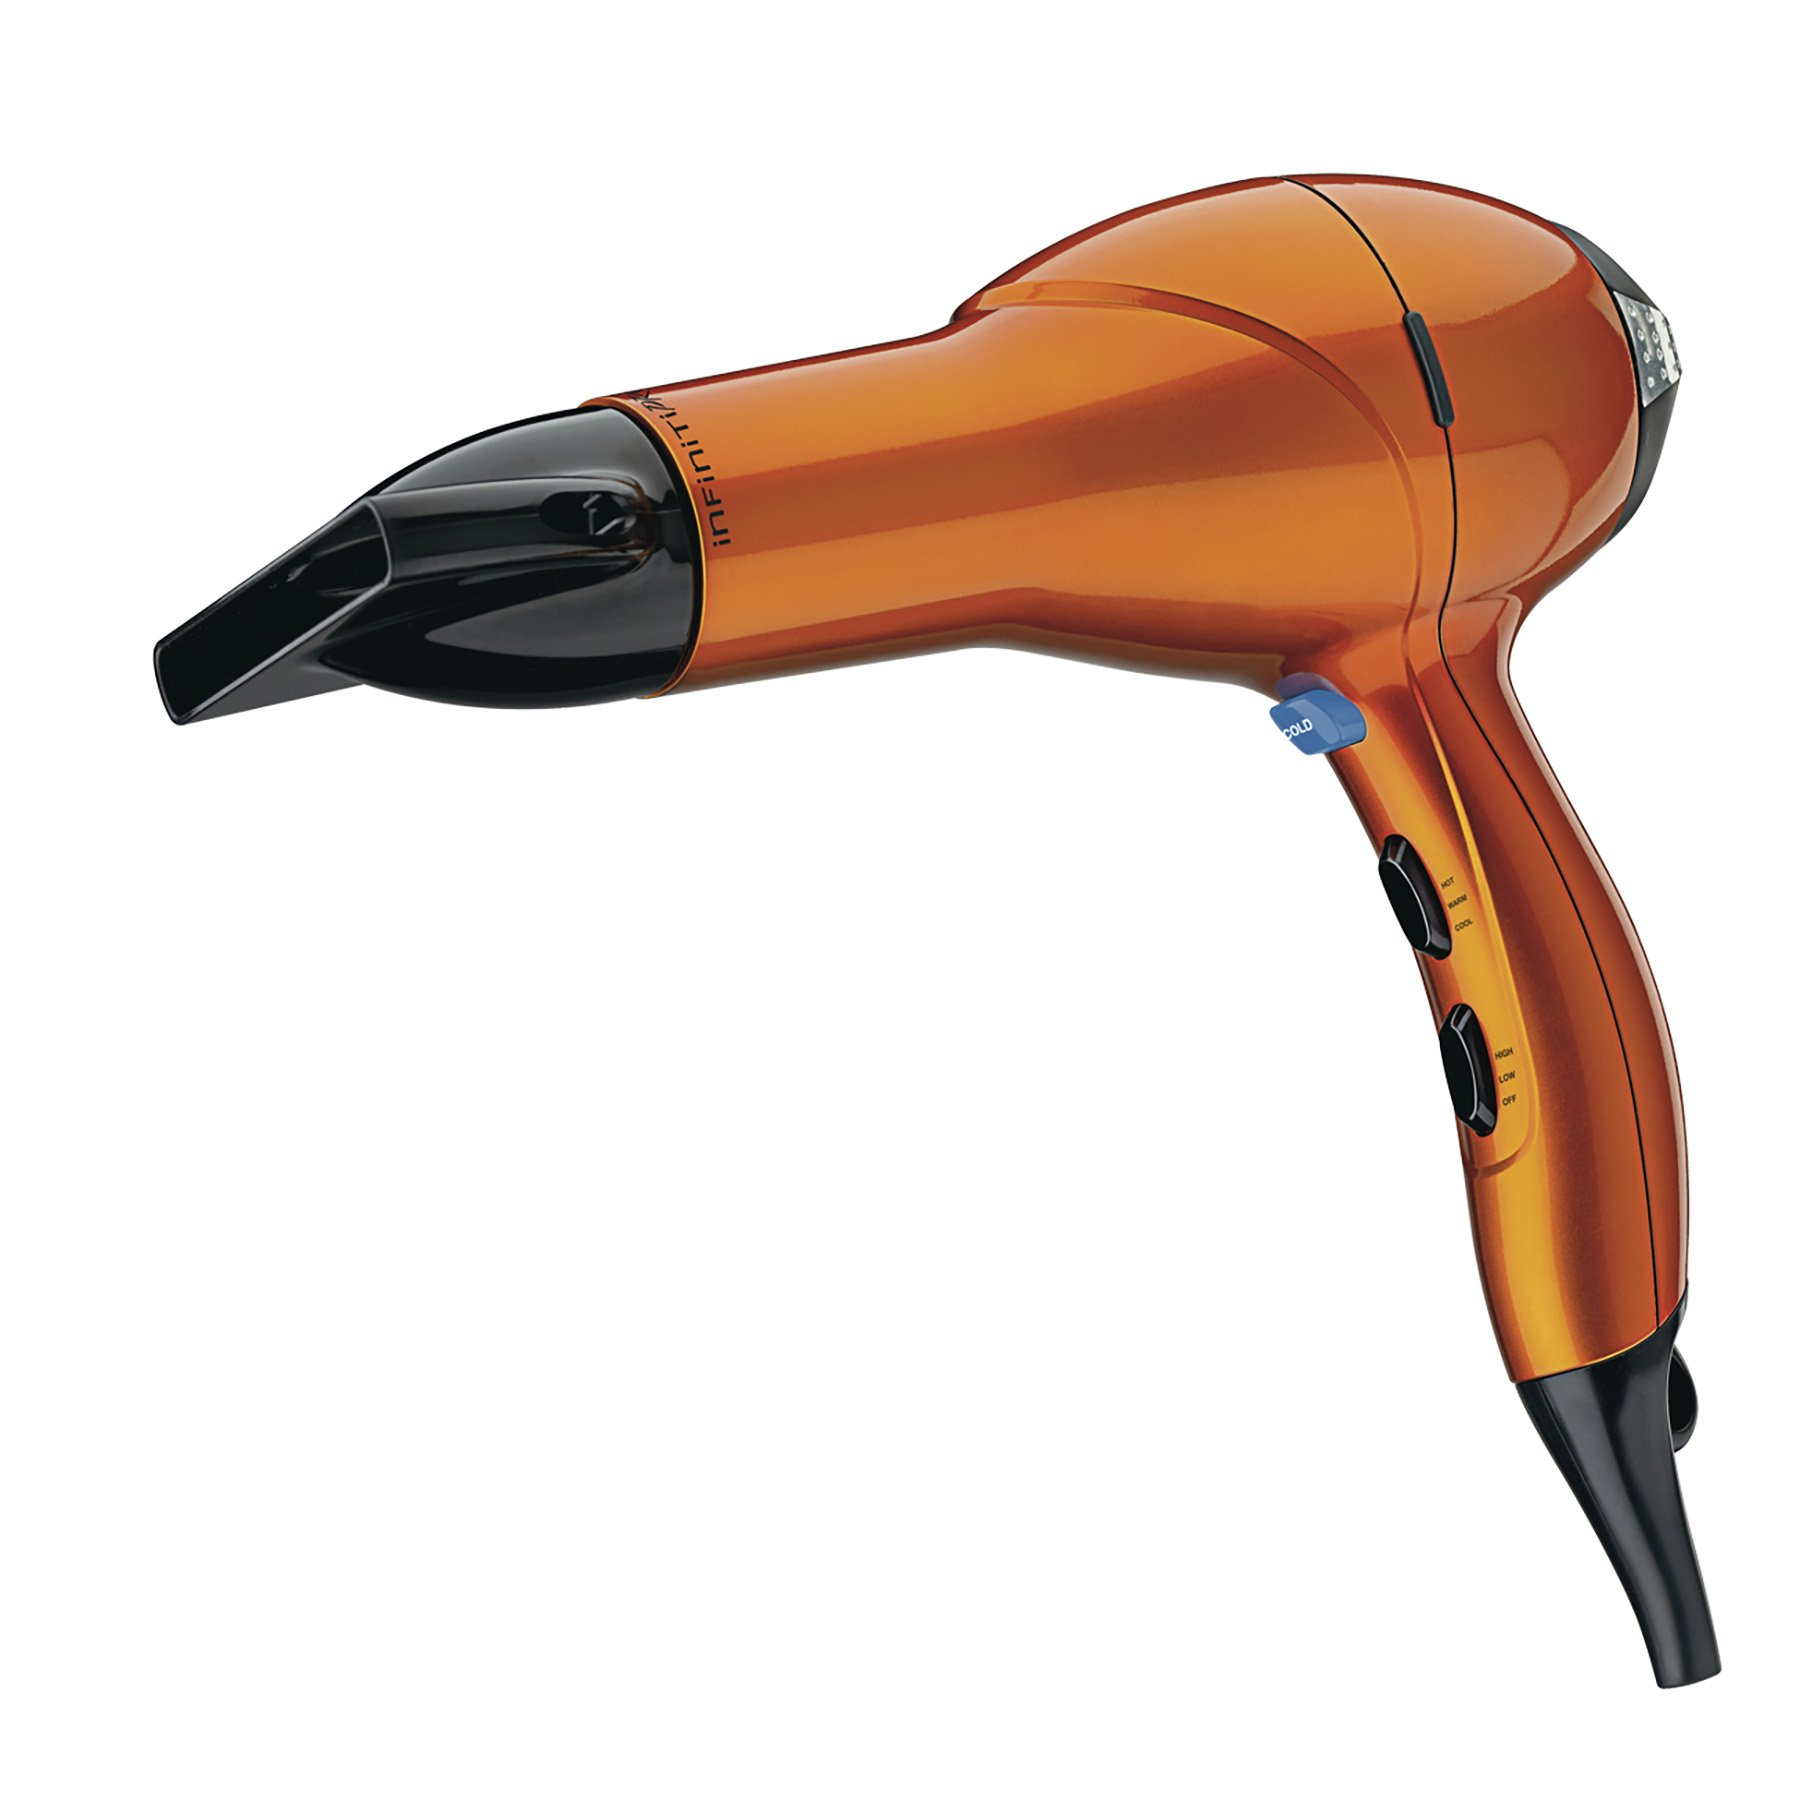 Infiniti Pro by Conair 1875 Watt Salon Performance AC Motor Styling Tool / Hair Dryer; Orange  (packaging may vary)